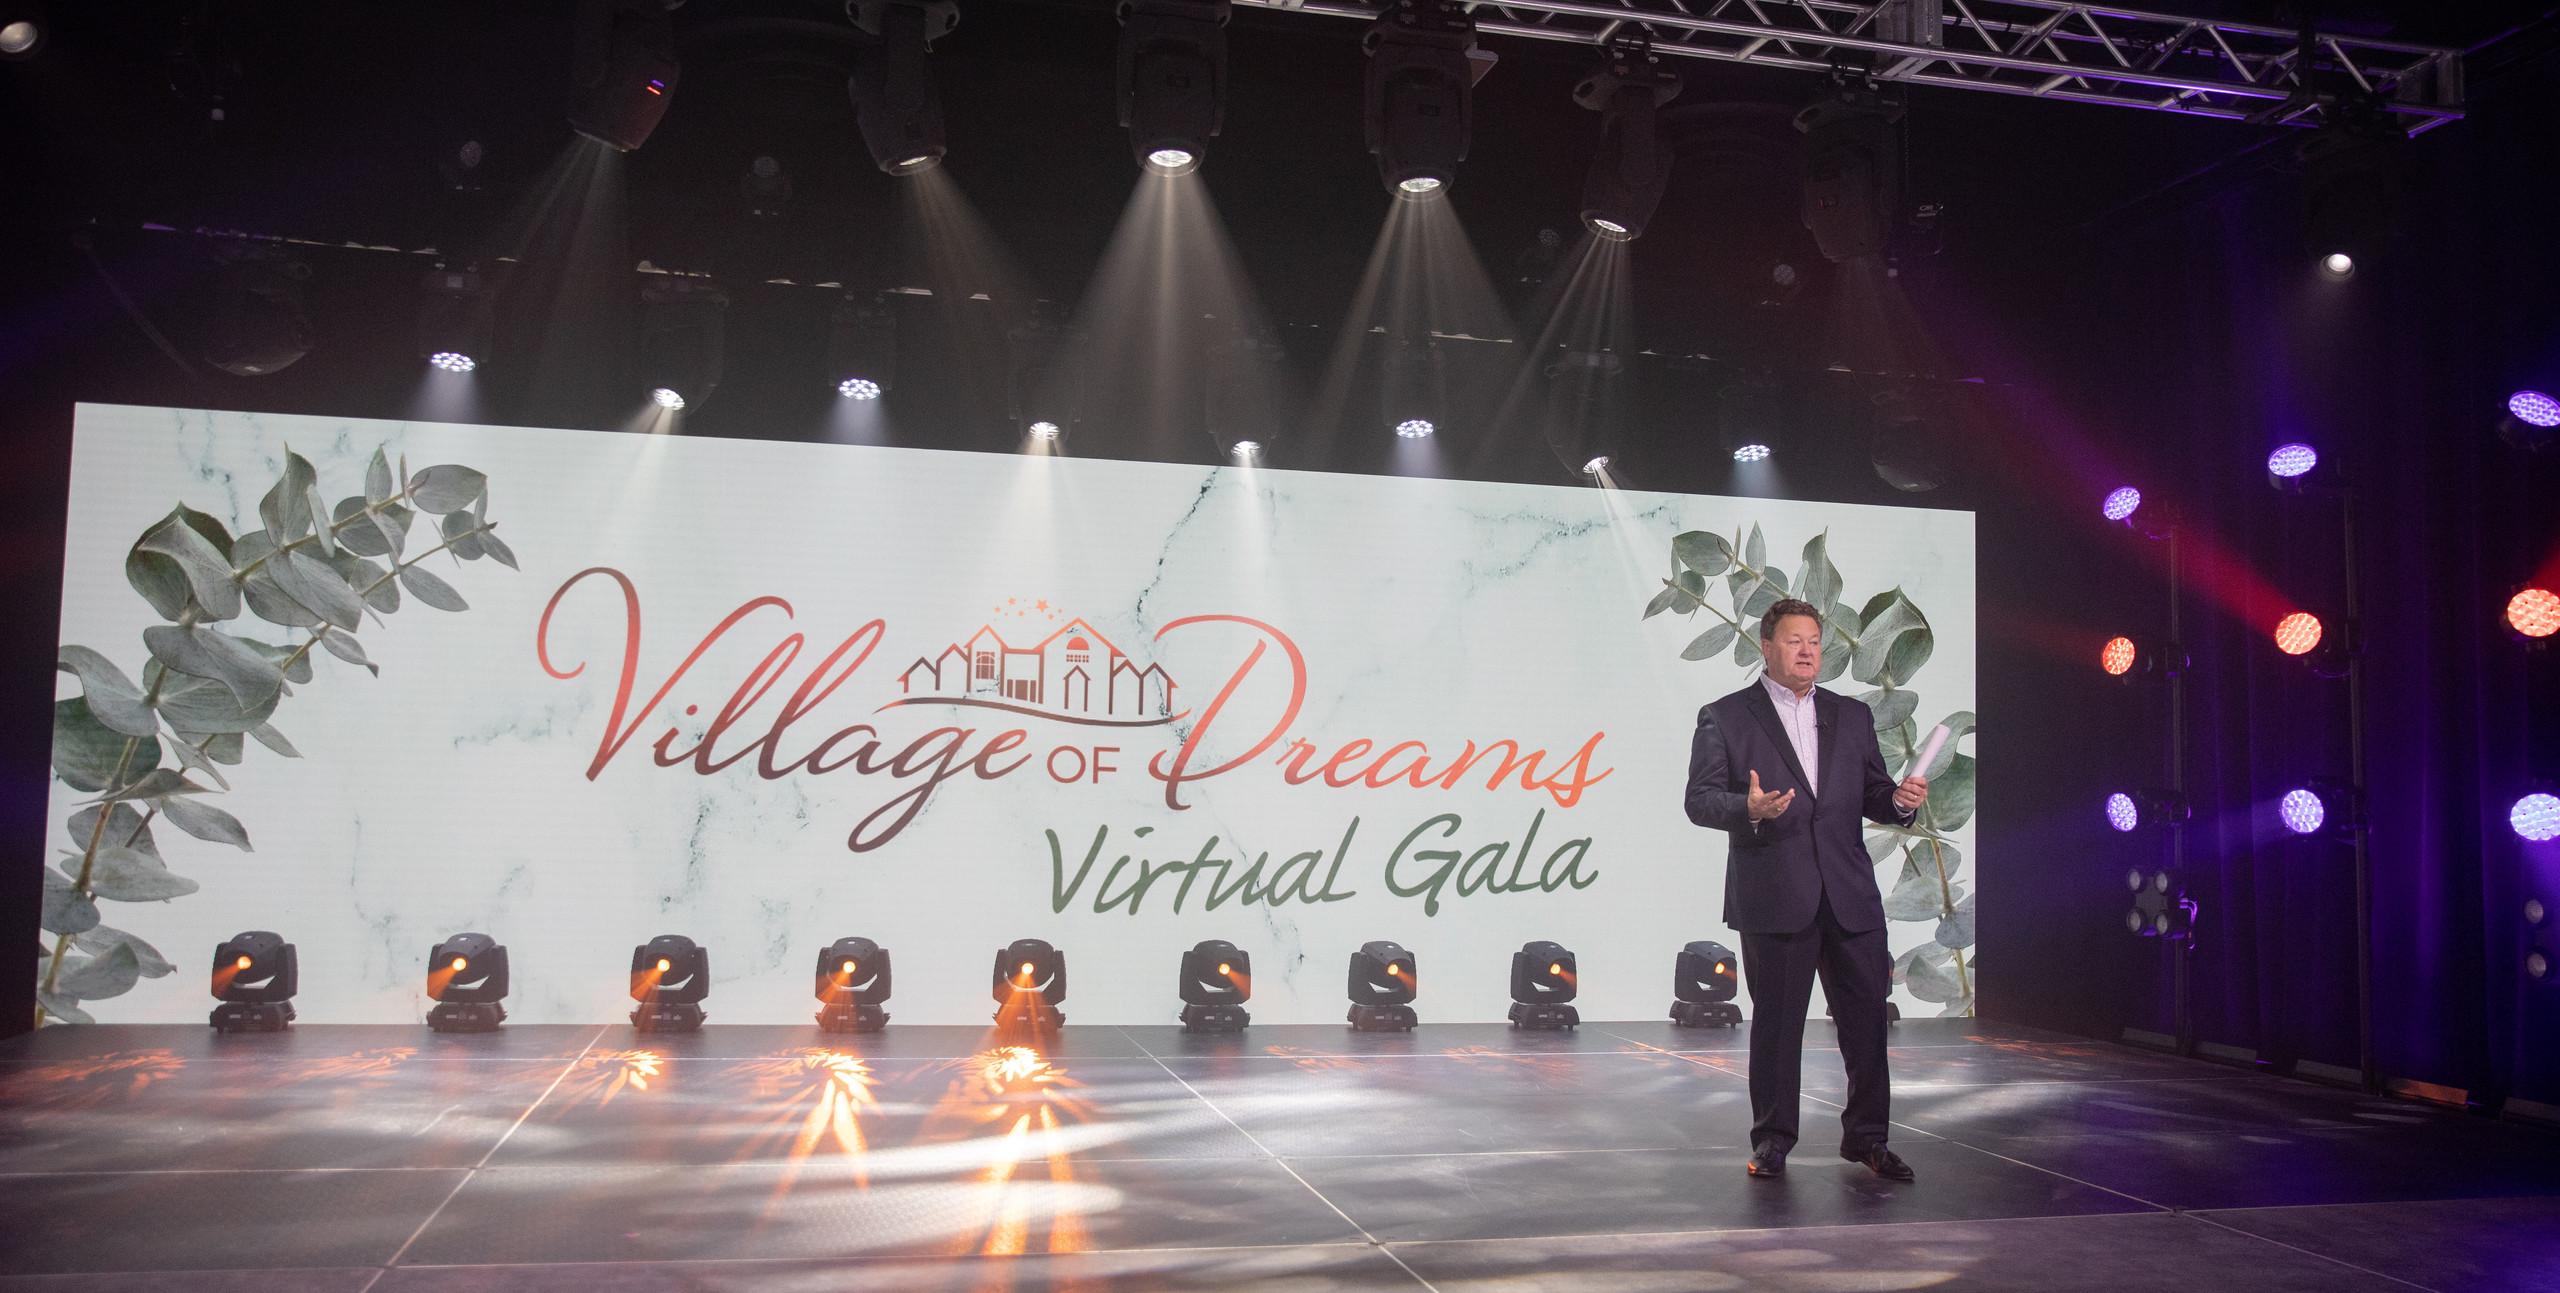 Riverview School's virtual gala on stage in virtual studio